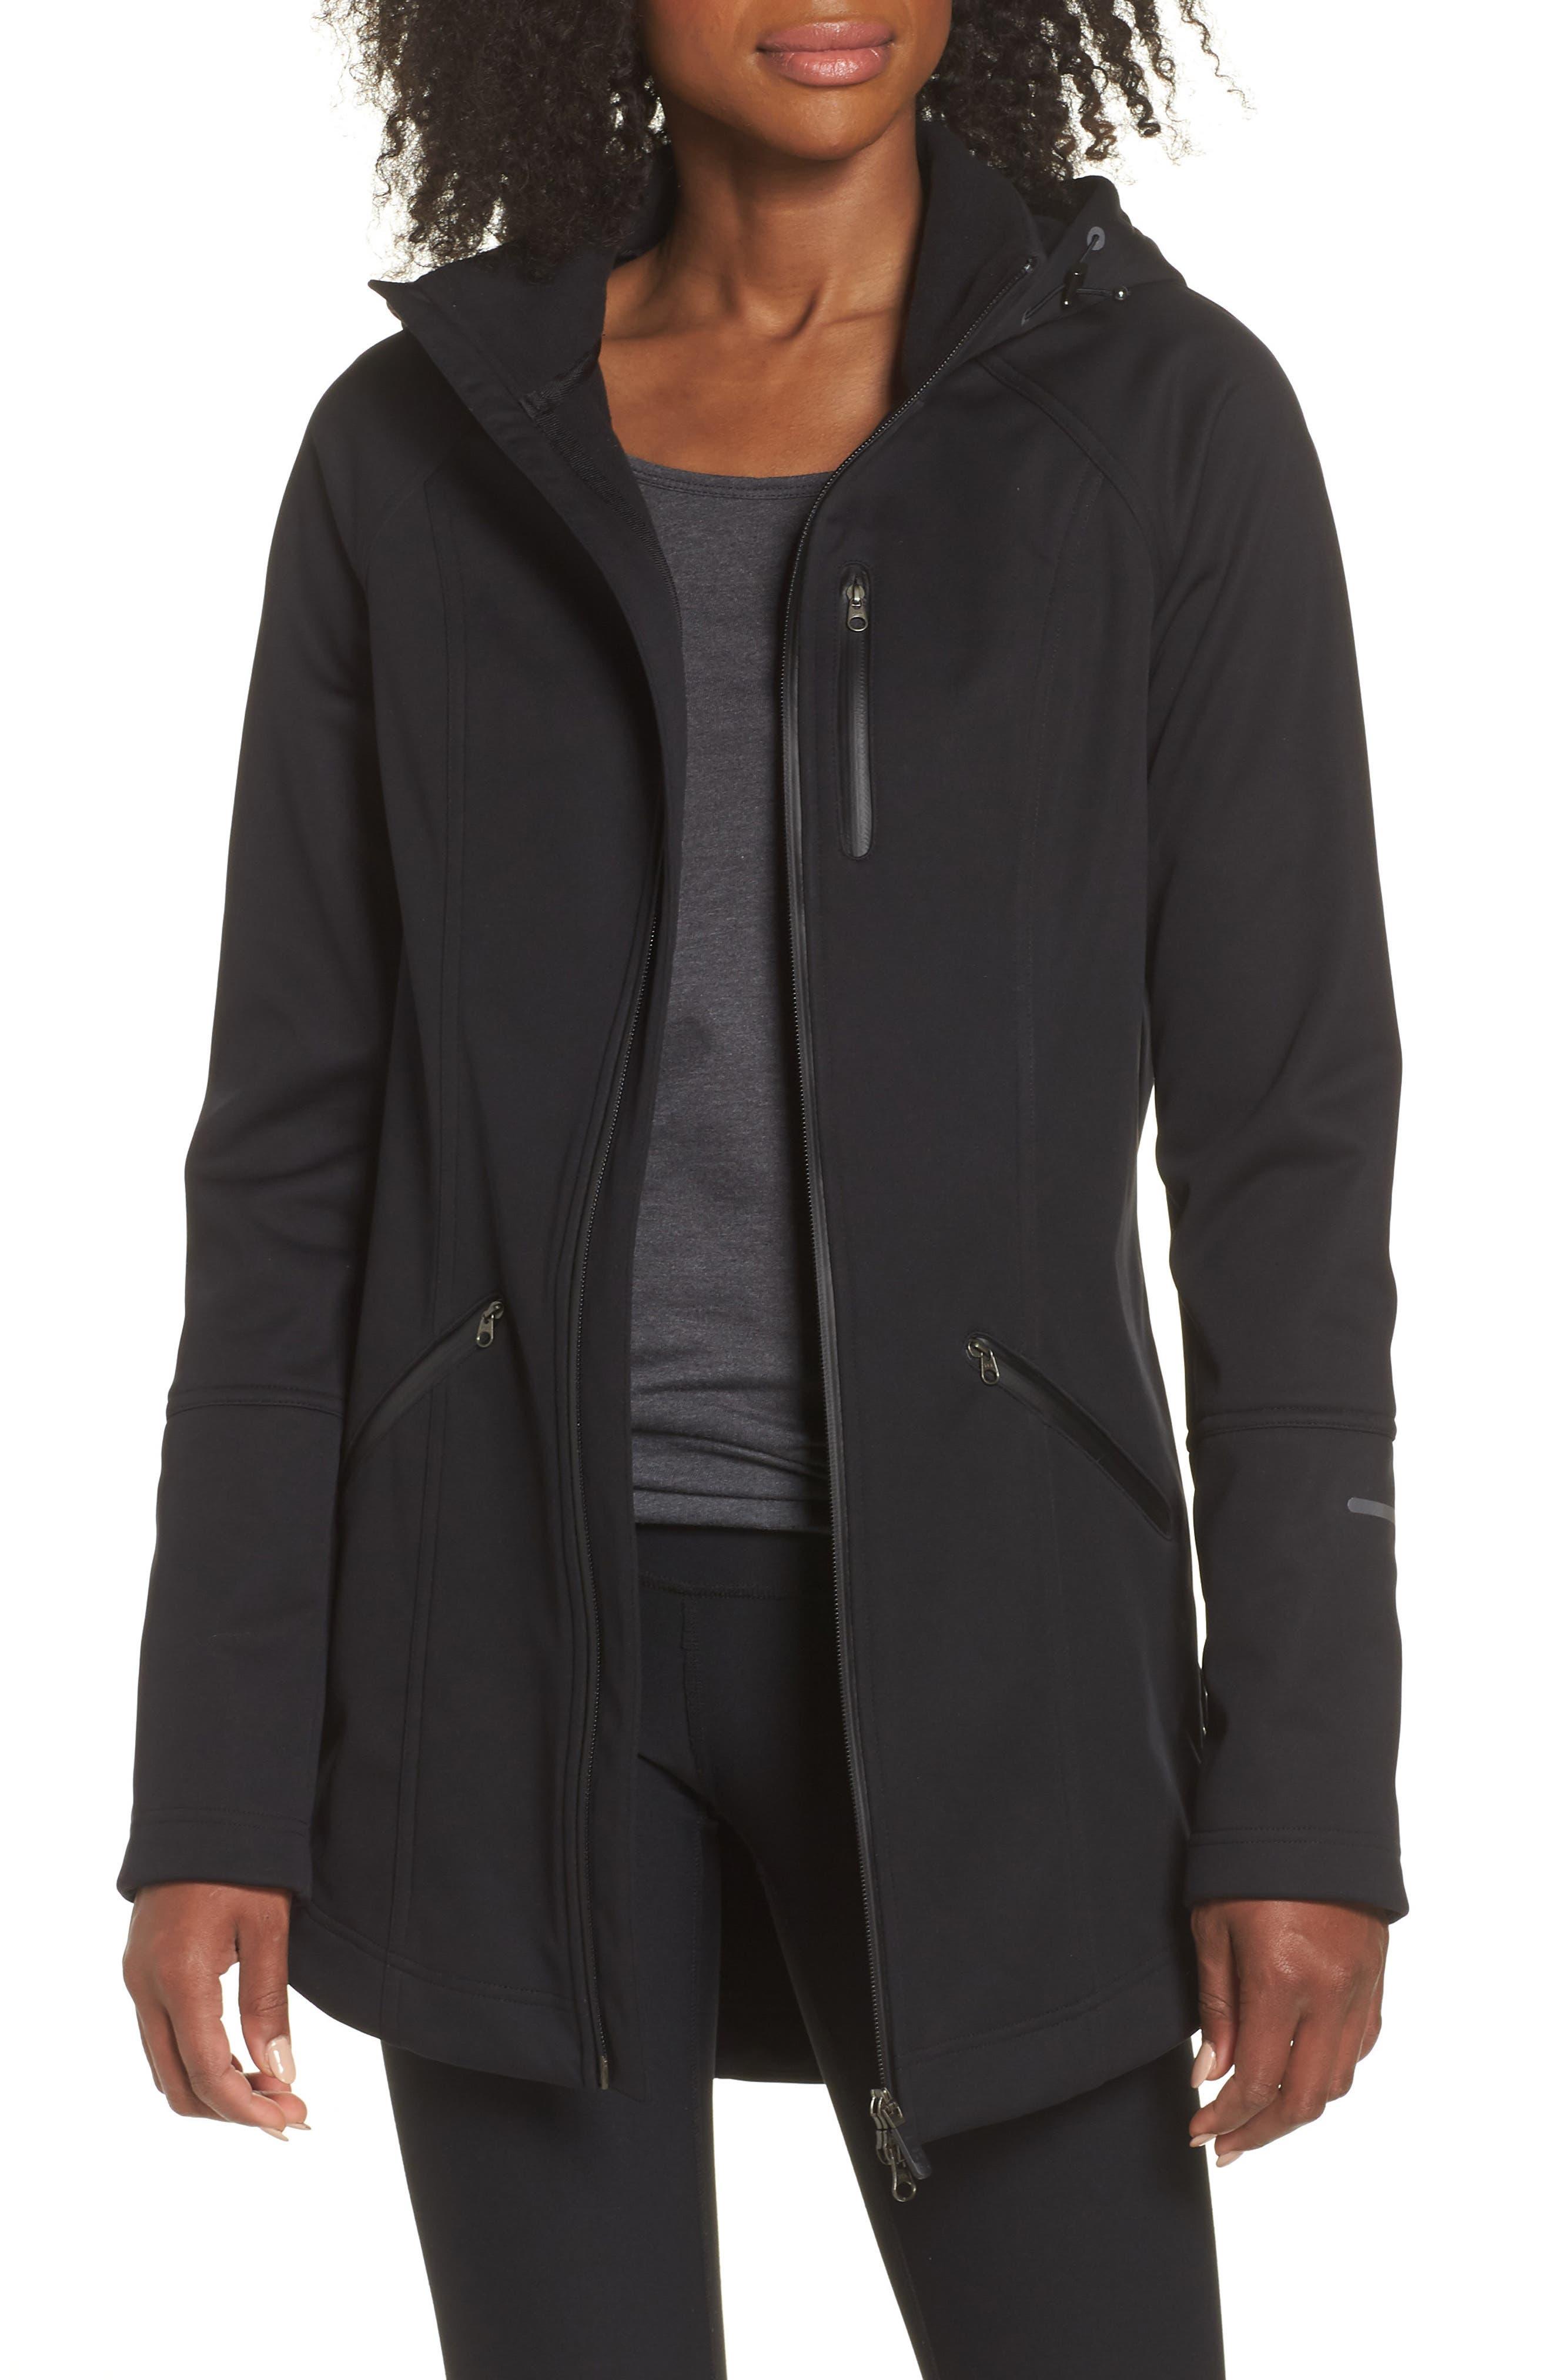 ZELLA Aero Hooded Soft Shell Training Jacket, Main, color, 001